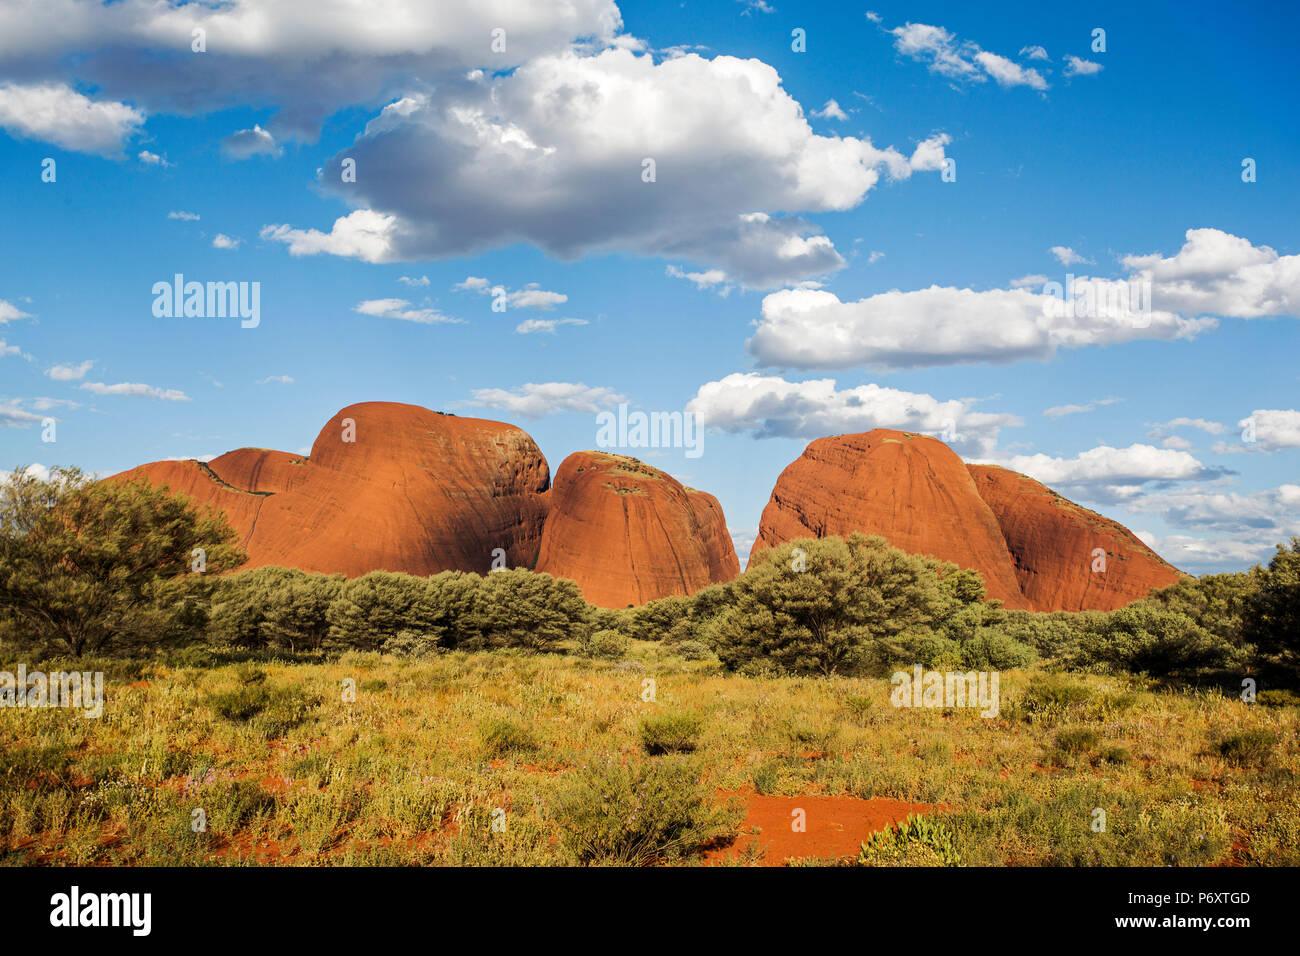 Kata Tjuta Centro Rojo. El Territorio del Norte, Australia Imagen De Stock